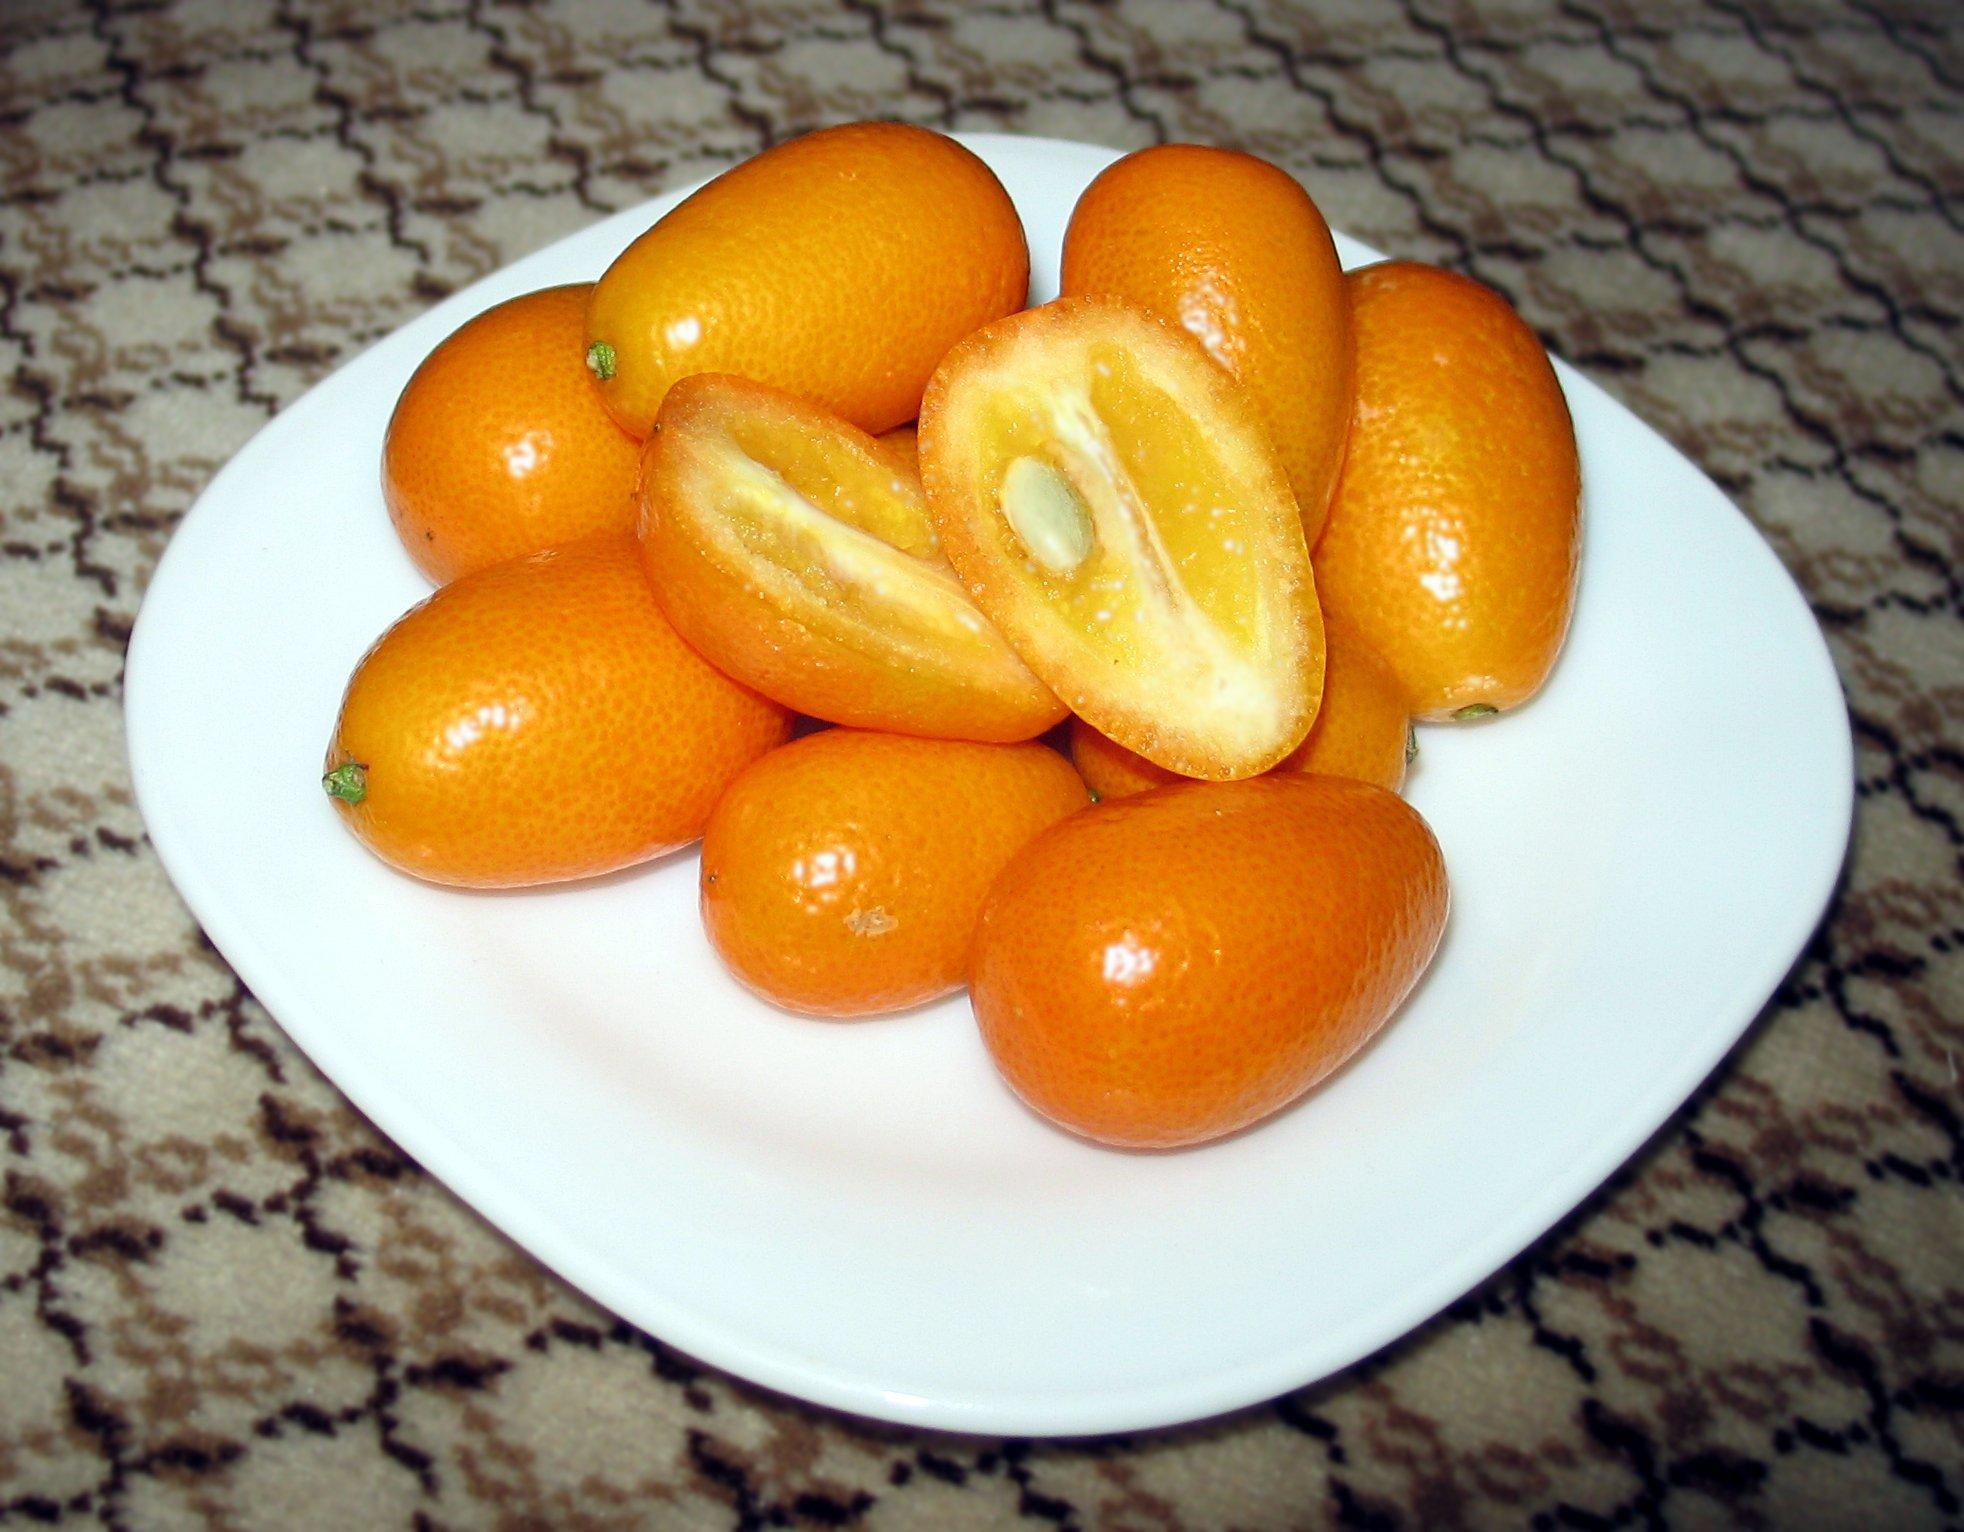 nagami-kumquat-inside